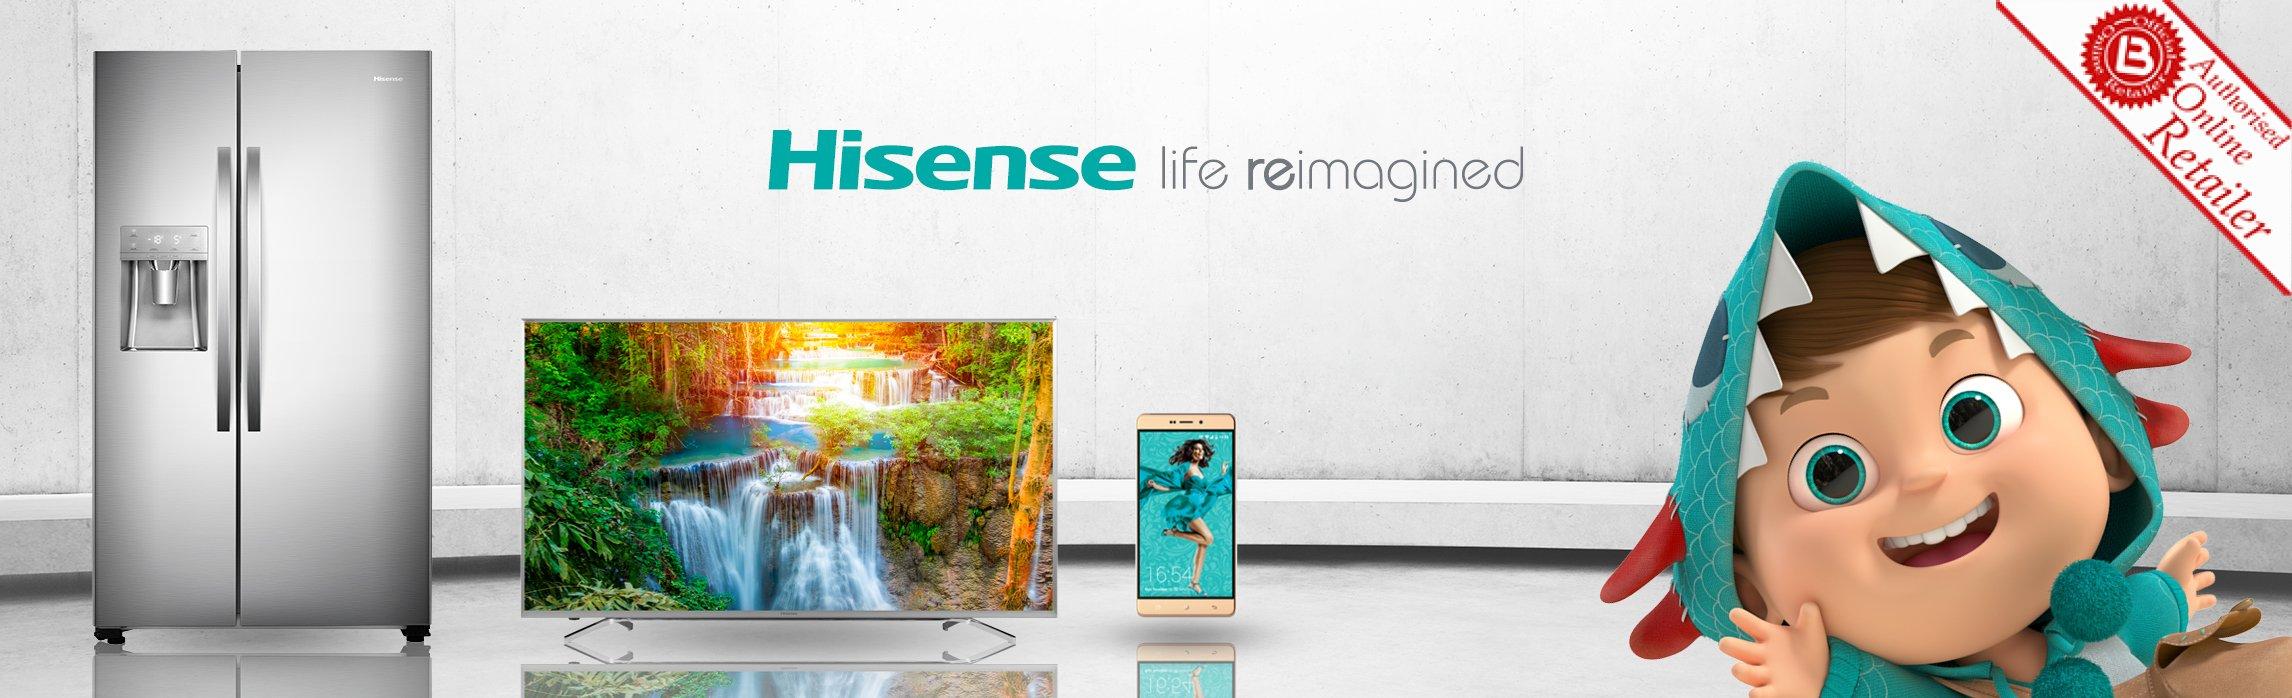 Hisense 298 l Frost Free Fridge with Water Dispenser 7